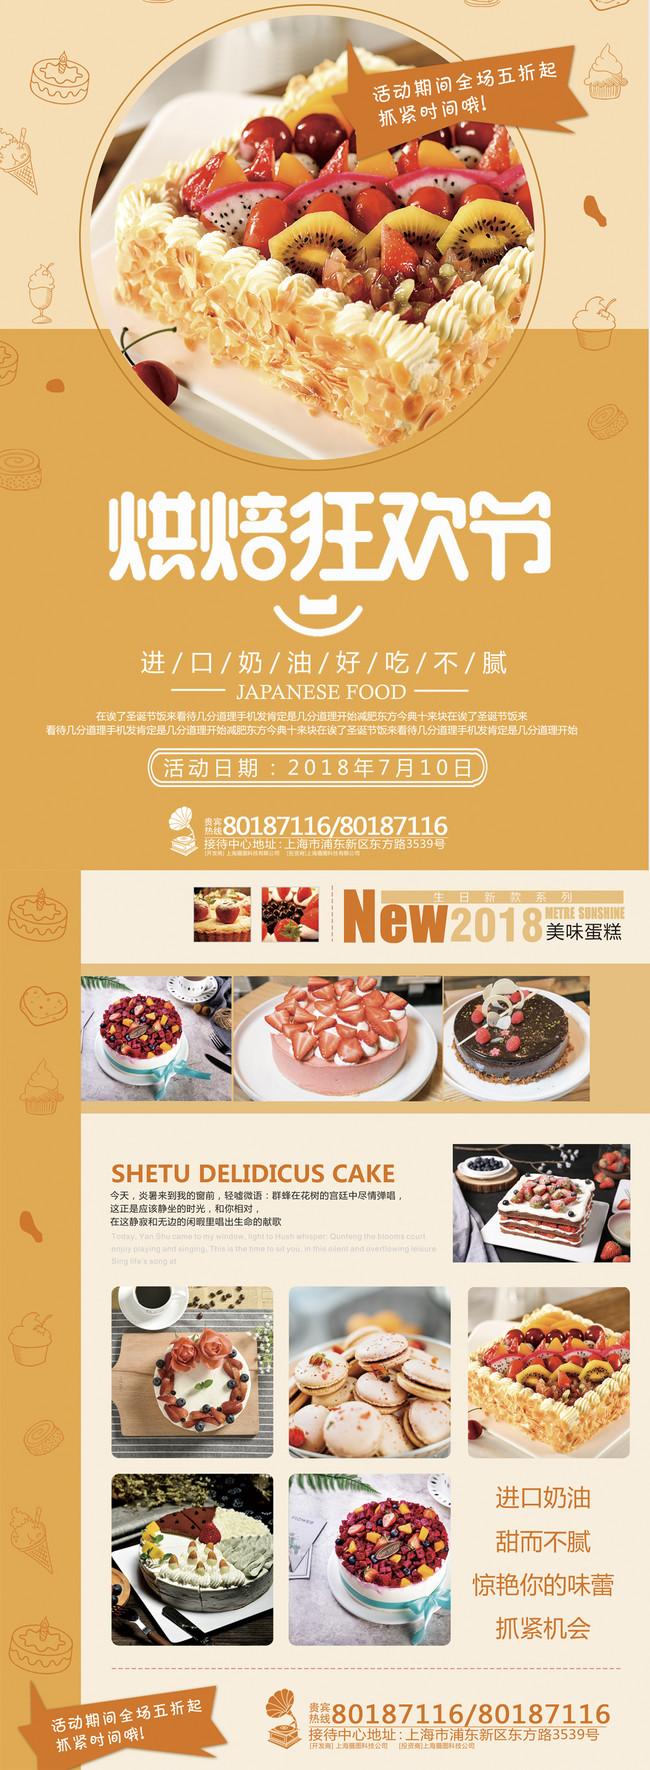 Leaflet Promosi Pastry Roti Gambar Unduh Gratis Templat 400237694 Format Gambar Psd Lovepik Com